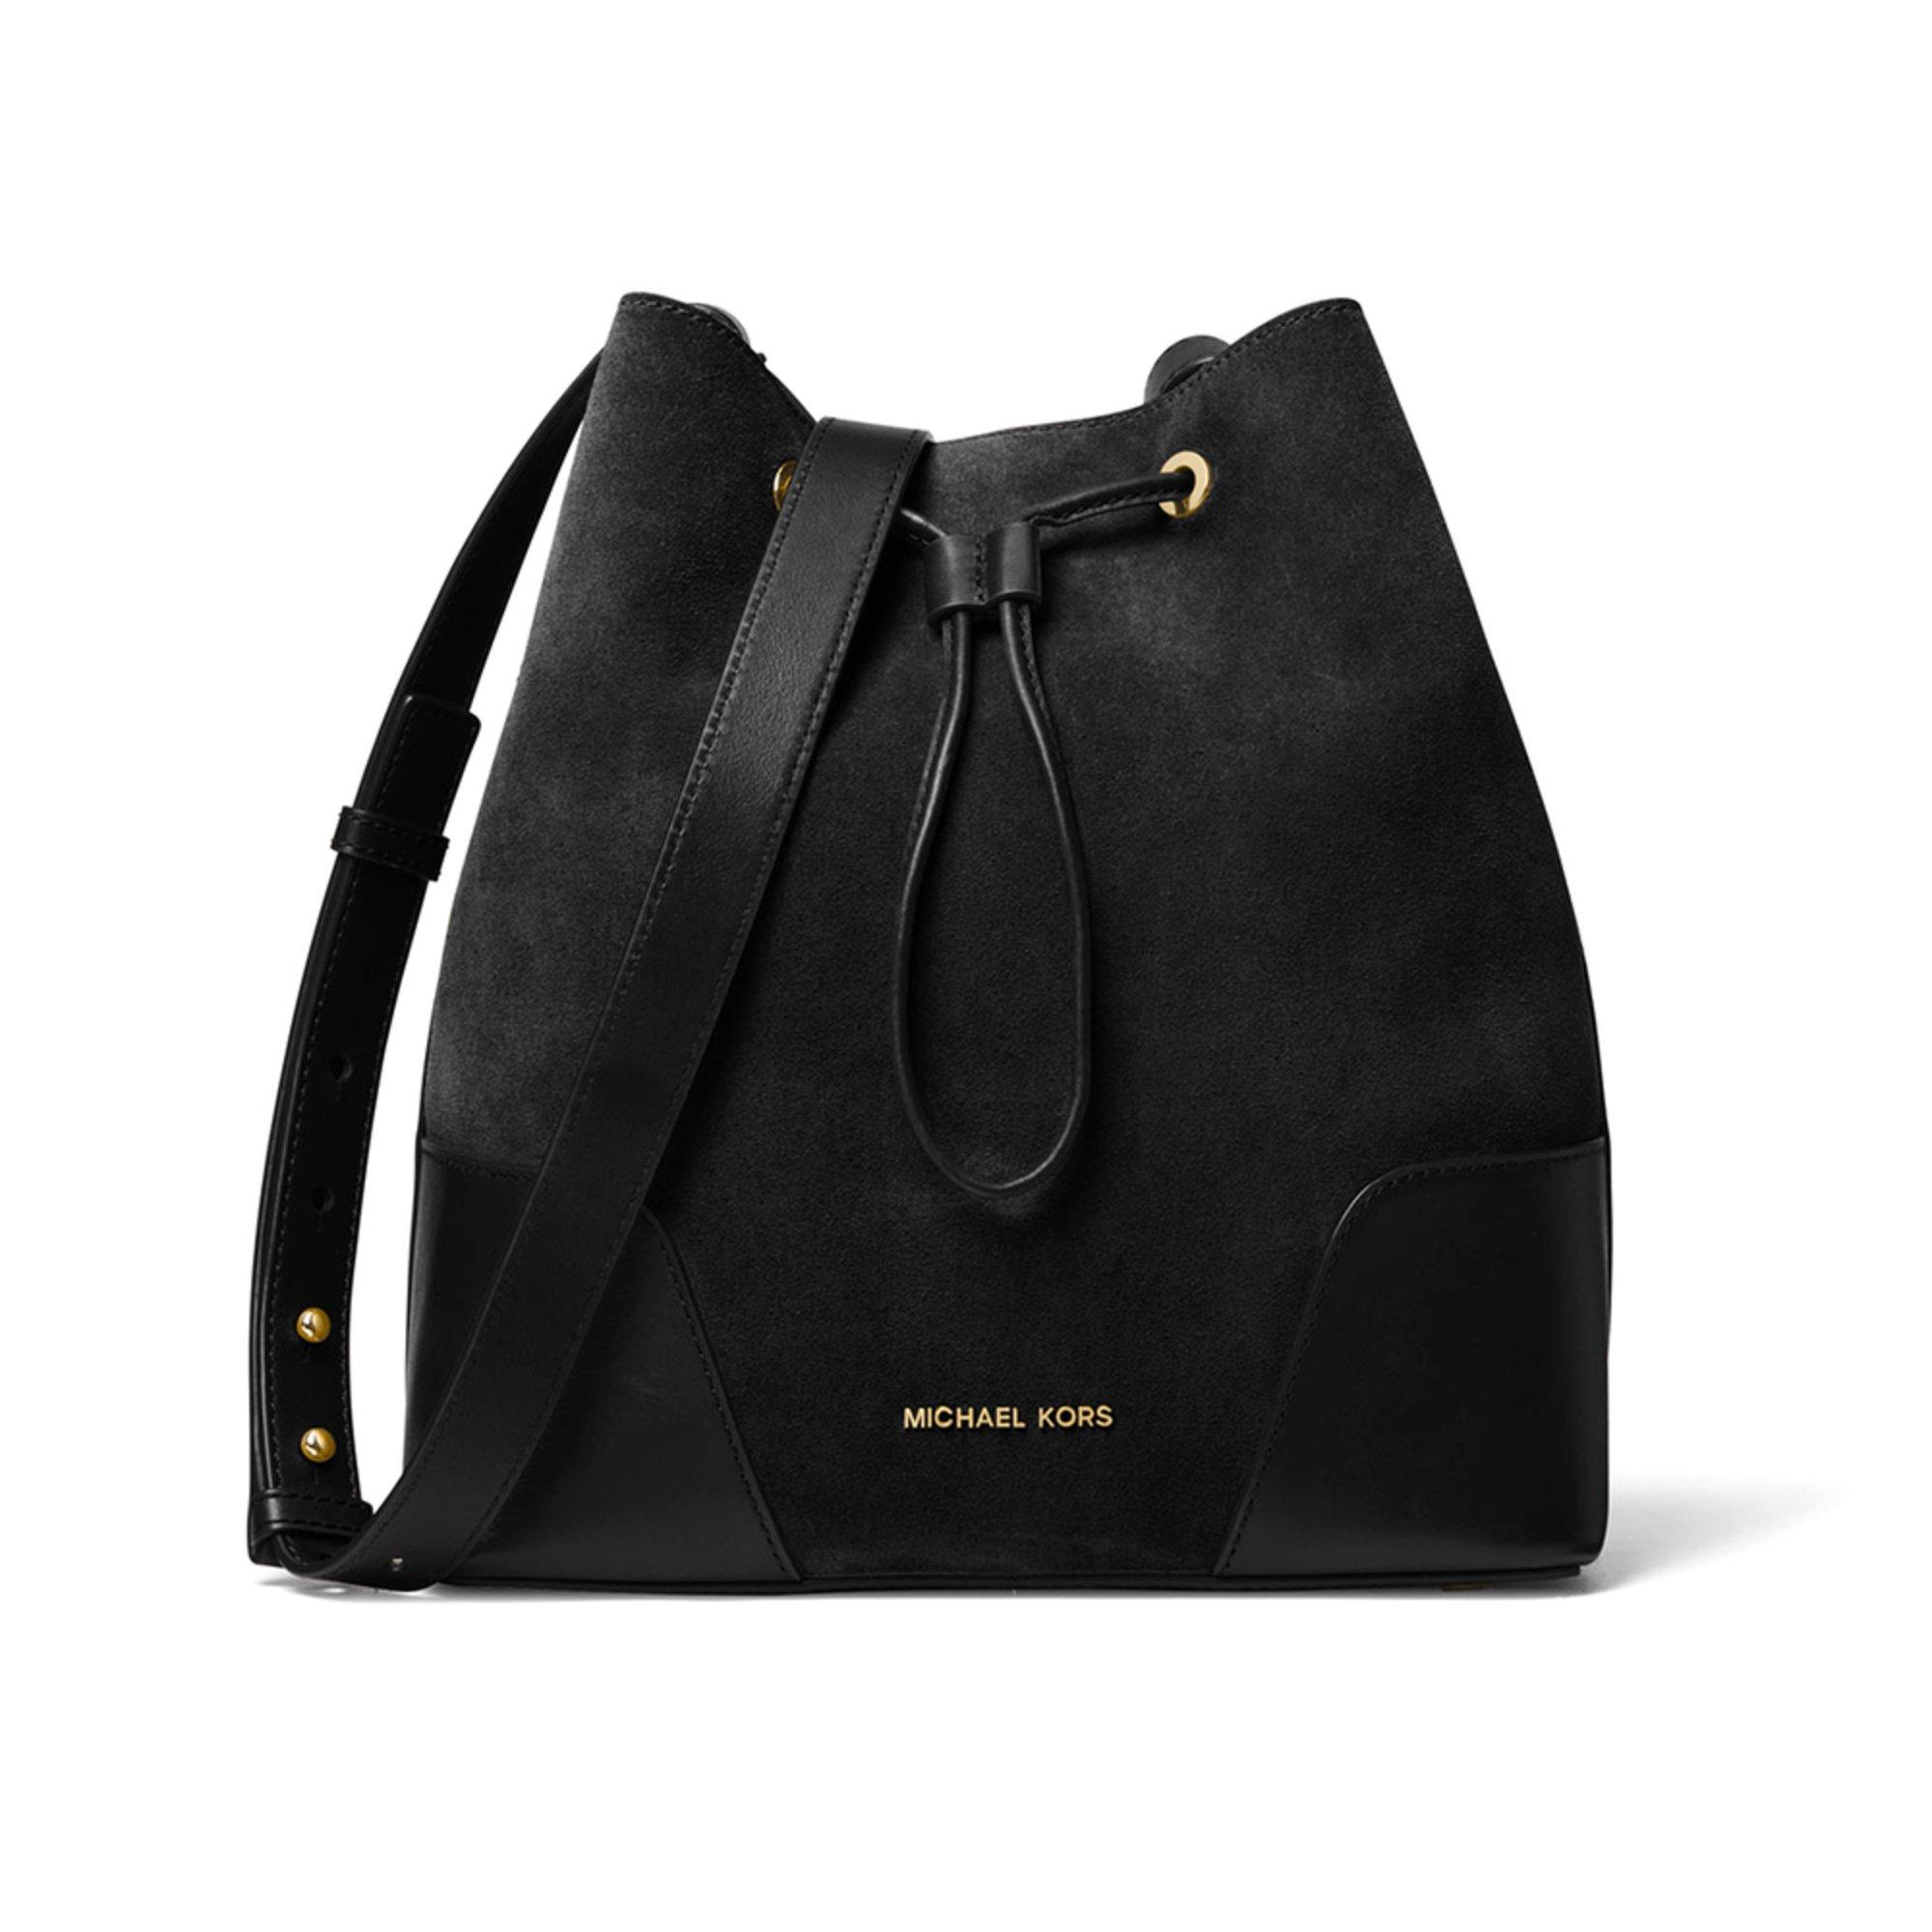 26a61eeebb78 Michael Kors Cary Medium Suede Bucket Bag | Crossbody & Messenger ...